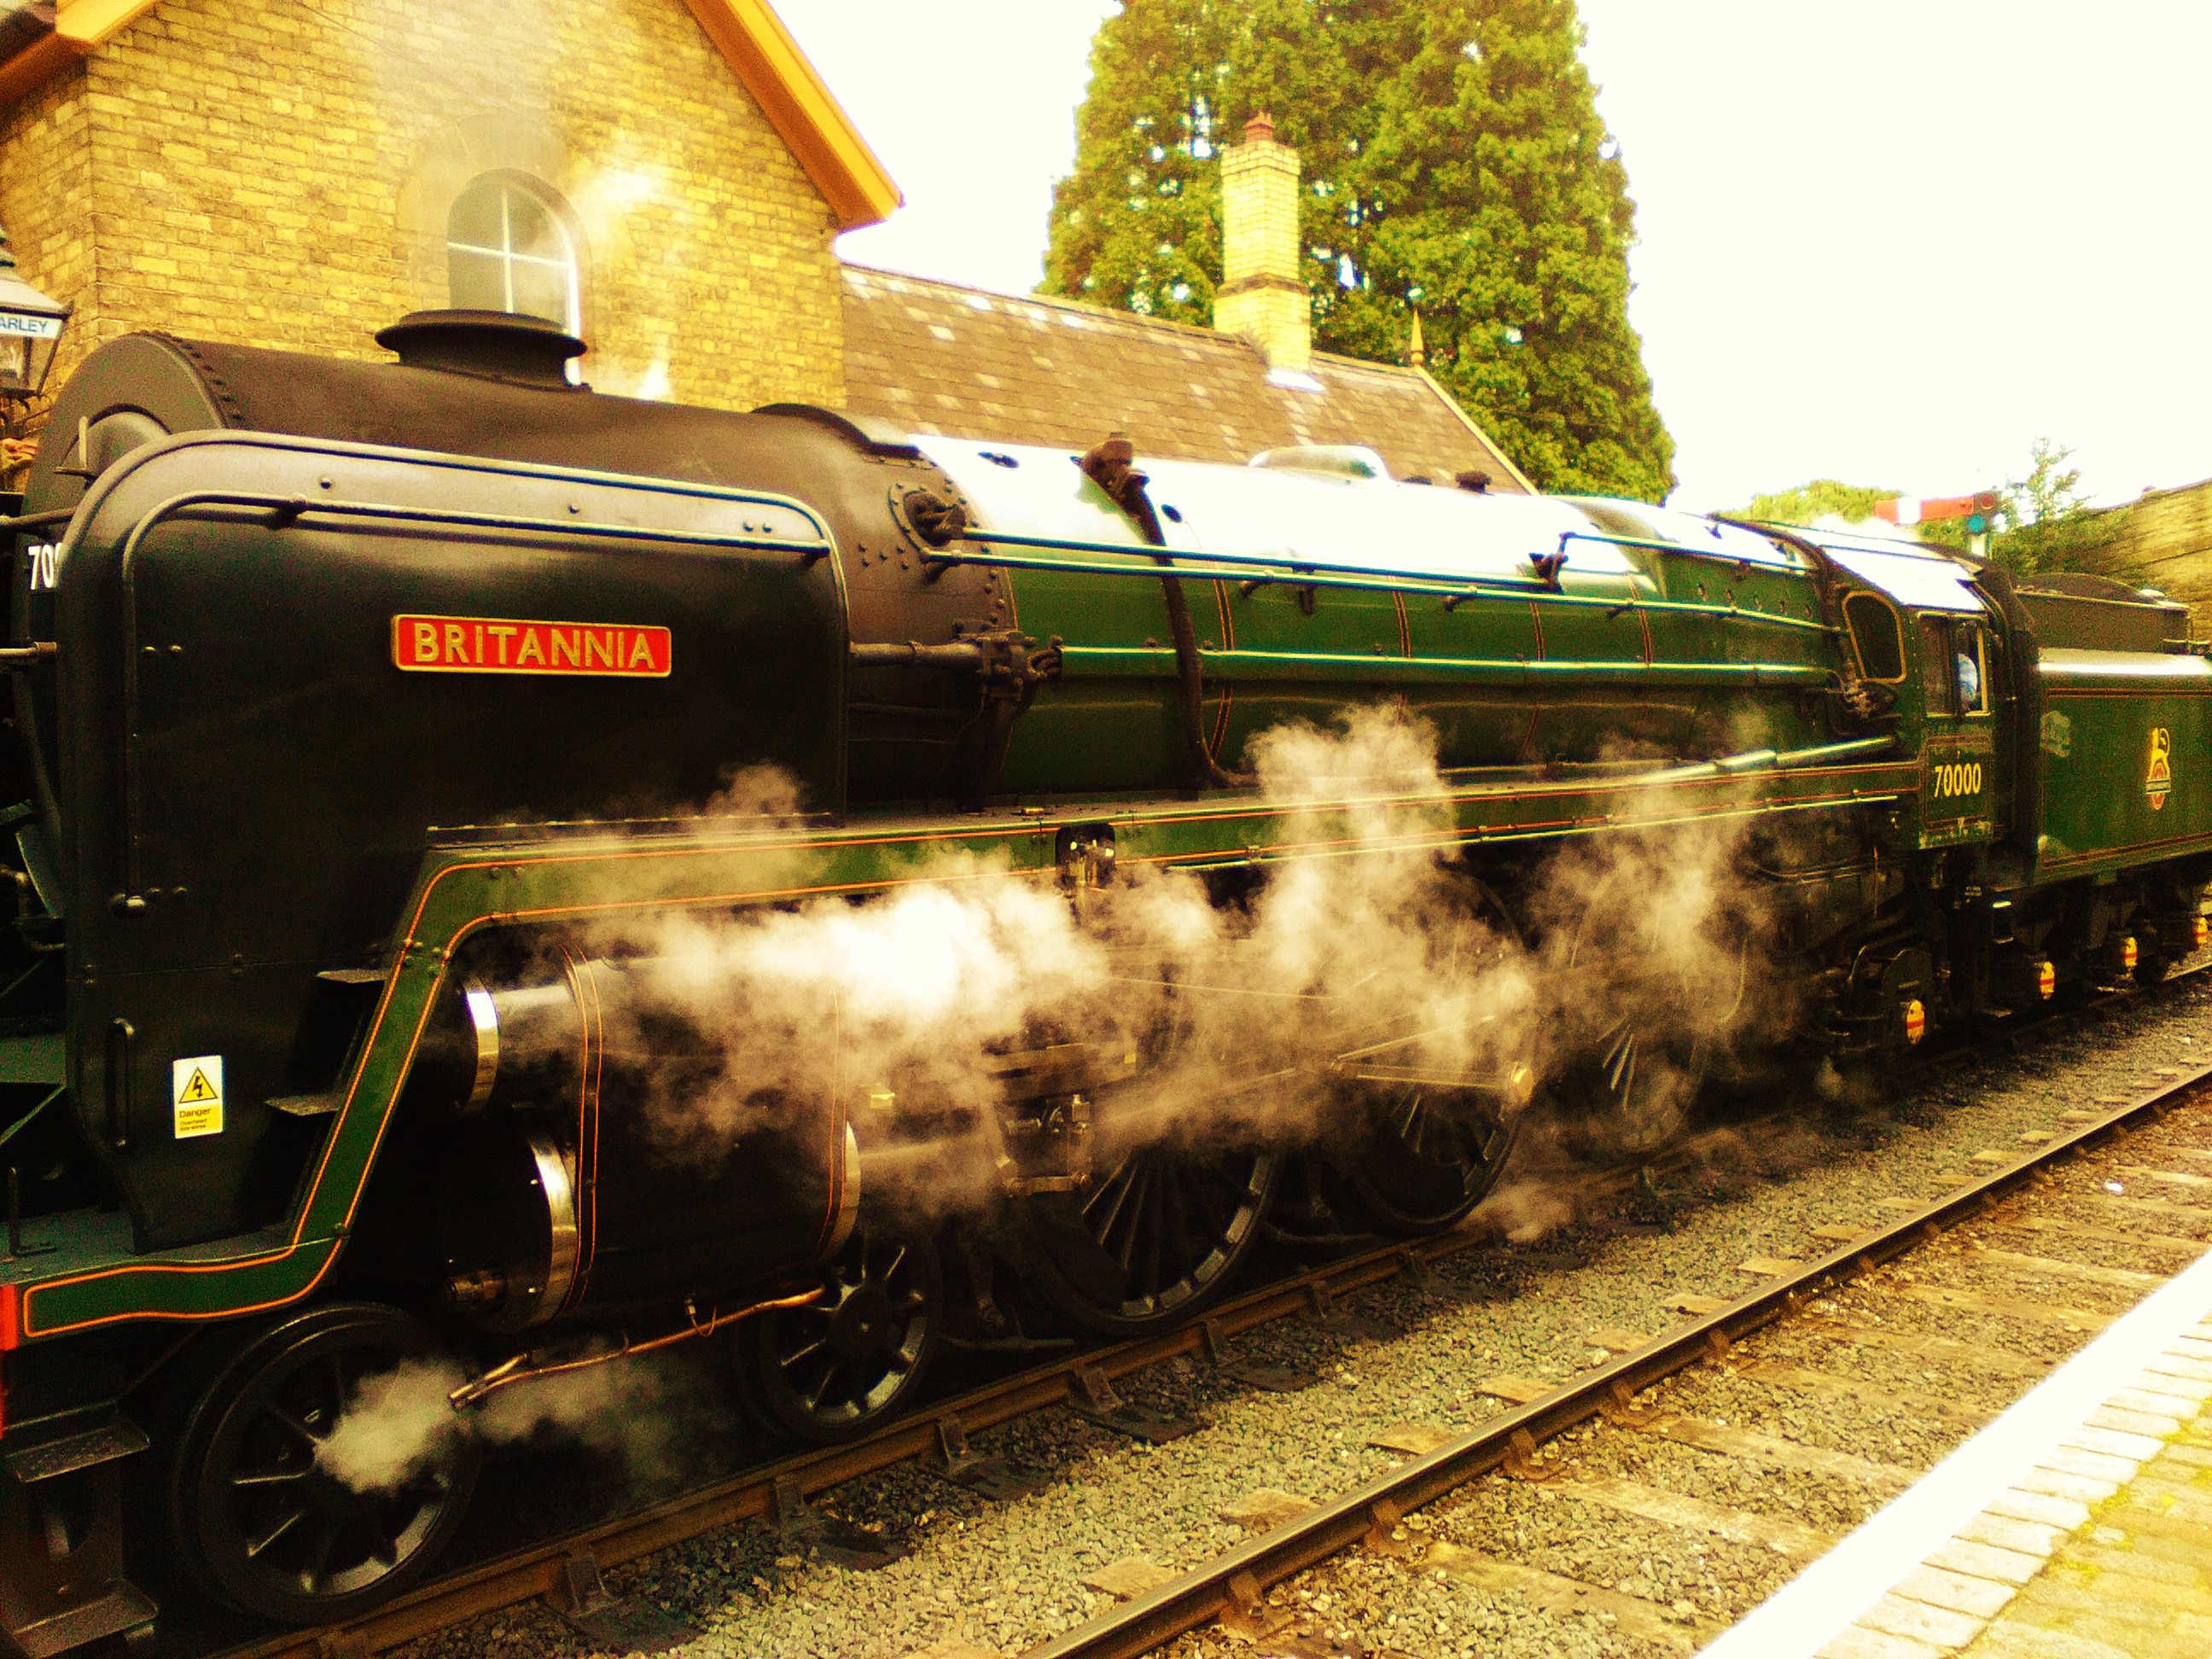 """Britannia"" at Arley Station"